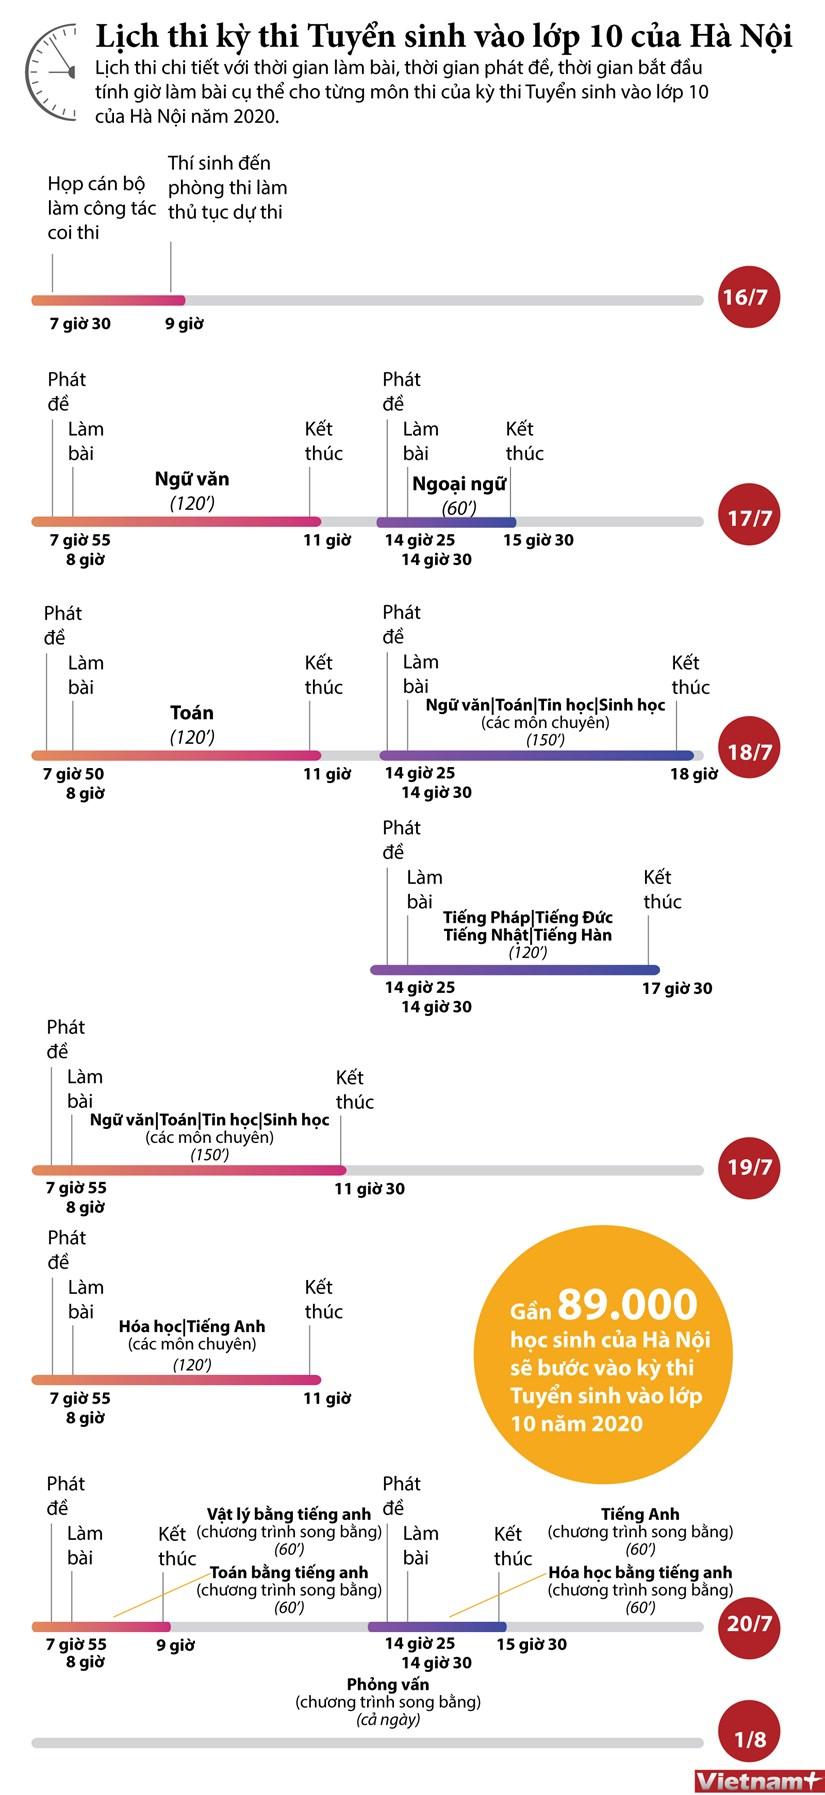 [Infographics] Lich thi tuyen sinh vao lop 10 cua Ha Noi hinh anh 1